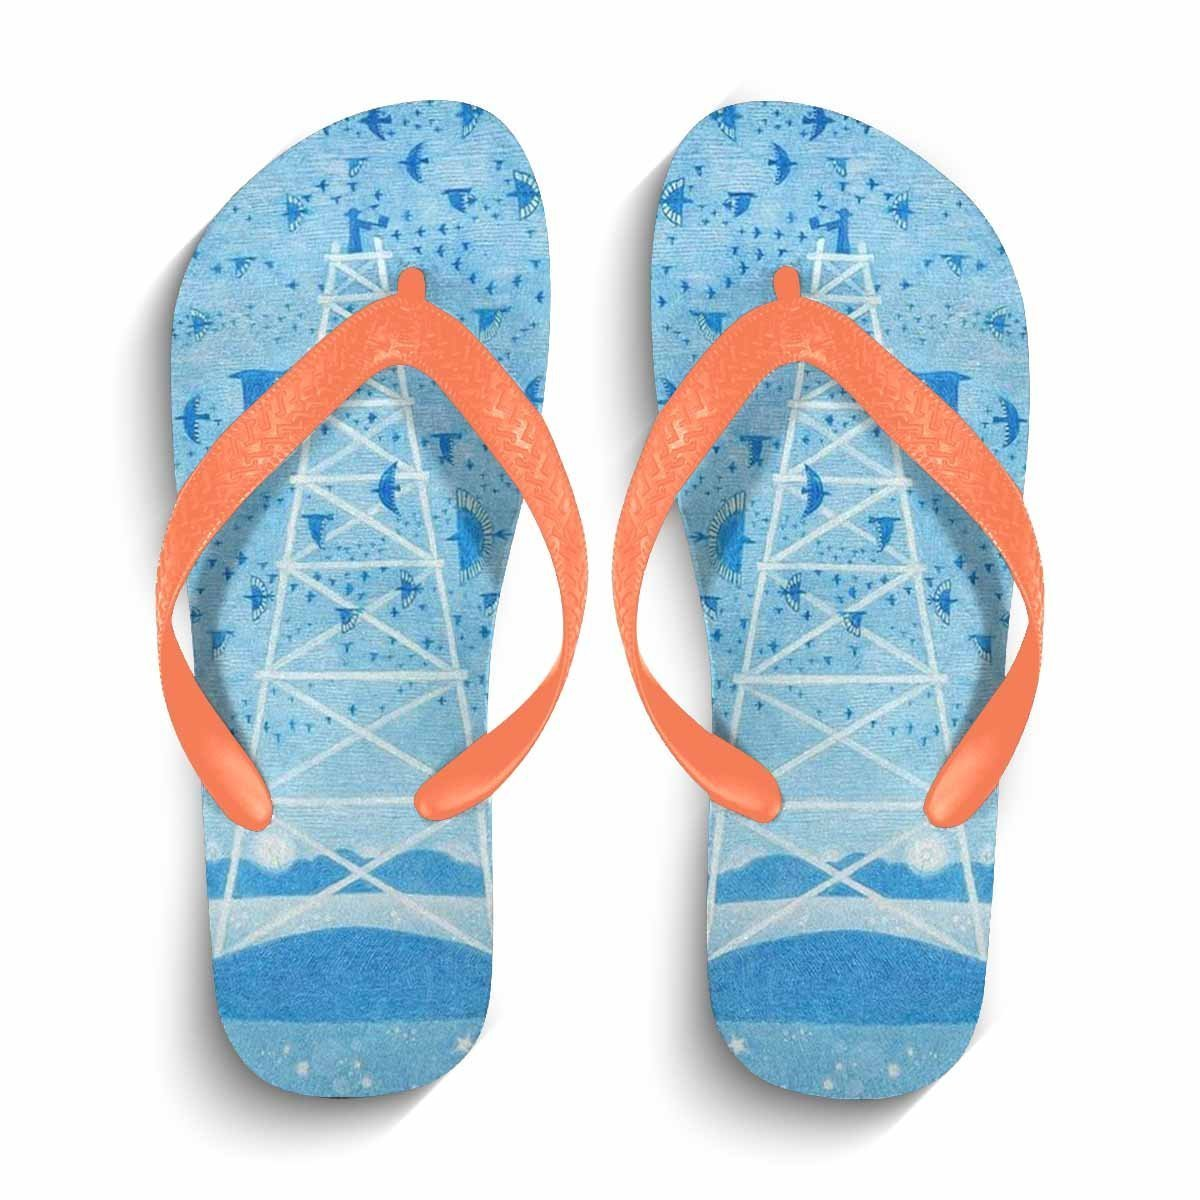 Flip Flops for Women Stylish Beach Flip Flops Summer Flip Flop Sandals Slippers